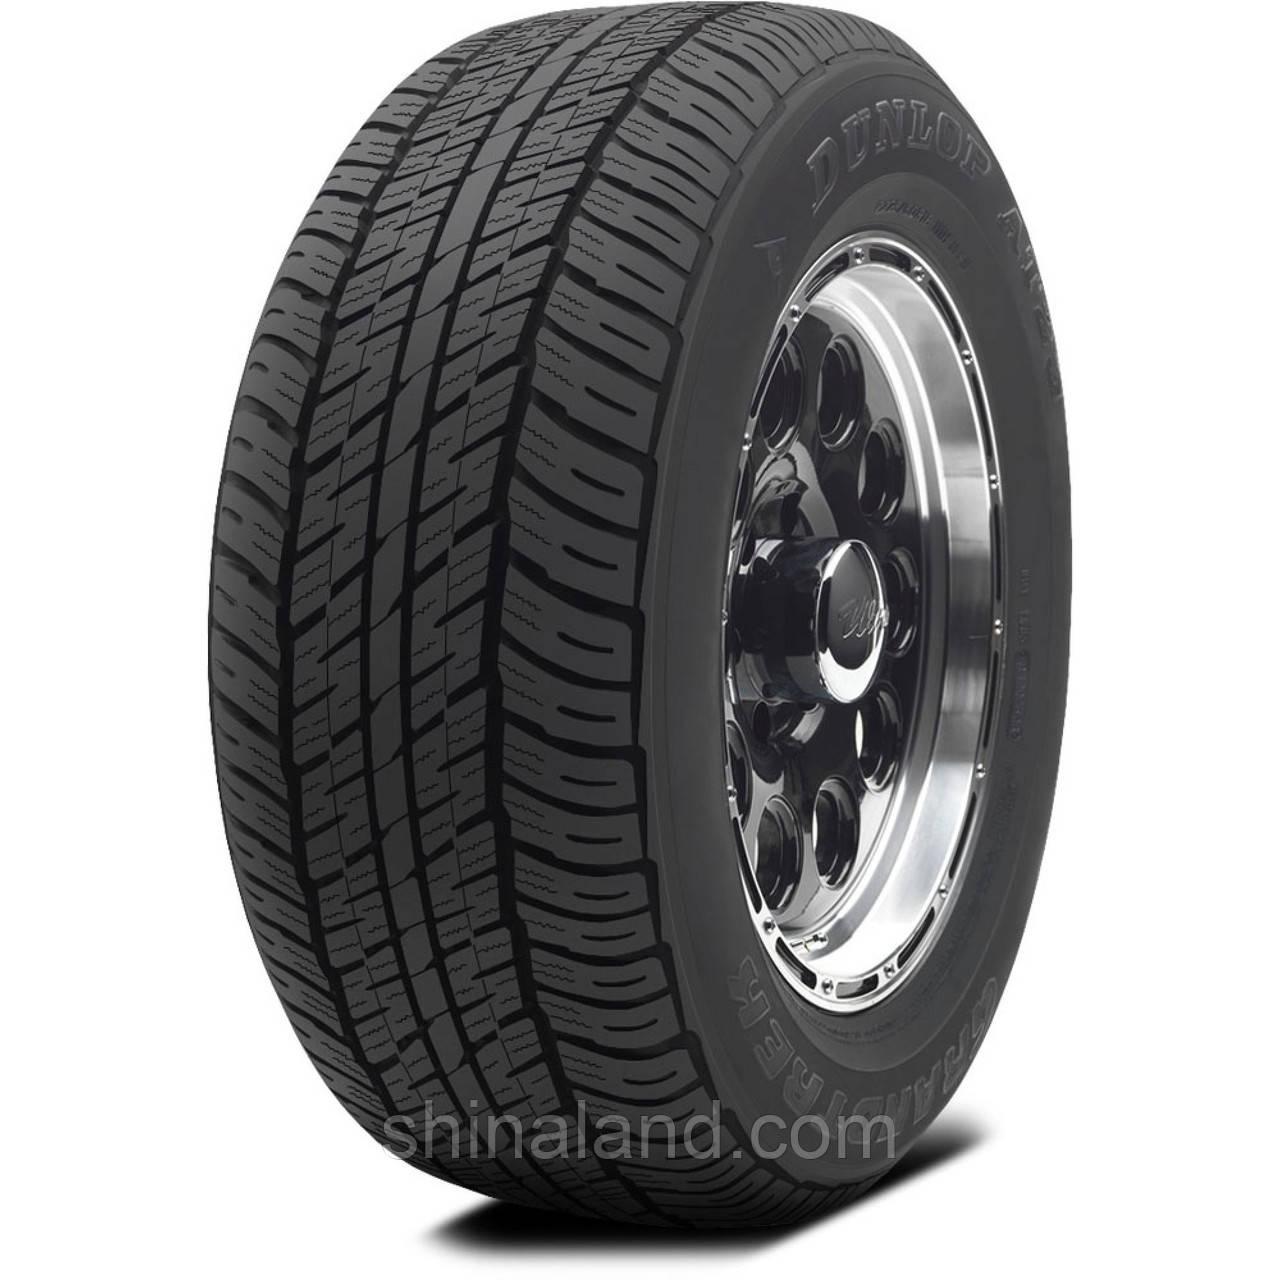 Летние шины Dunlop GrandTrek AT23 285/60 R18 116V 20--